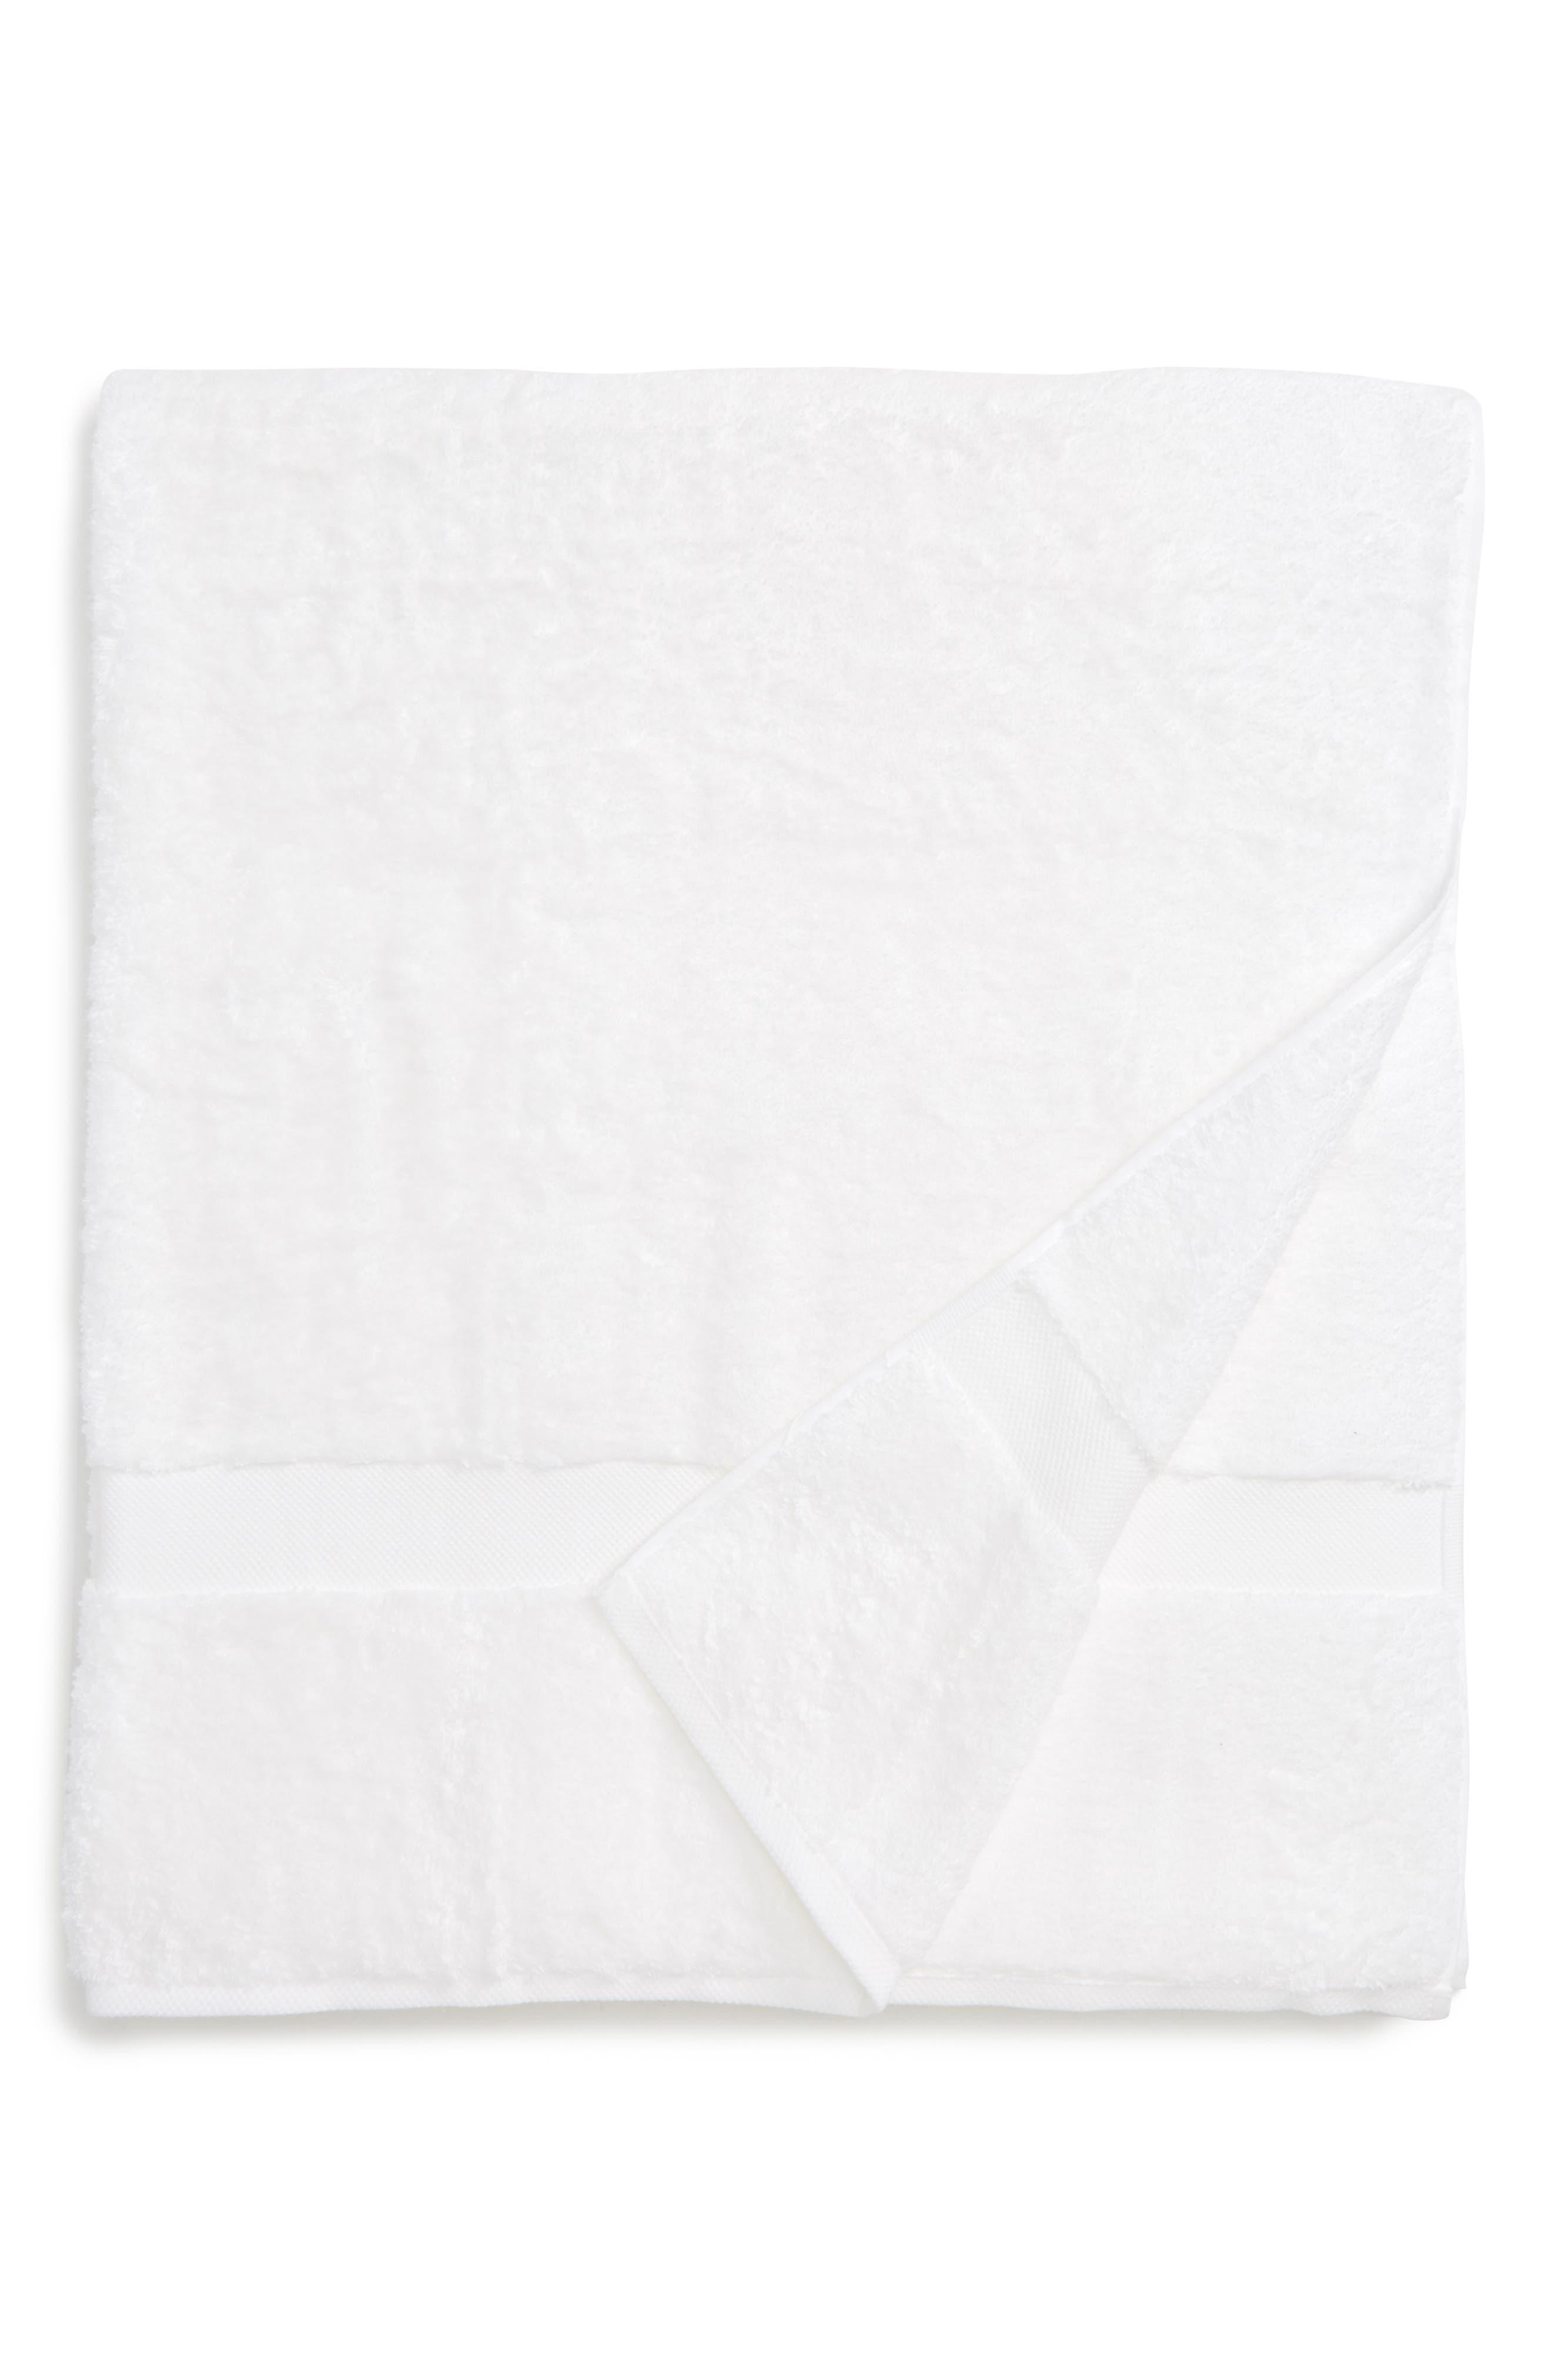 Lotus Bath Sheet,                             Main thumbnail 1, color,                             WHITE